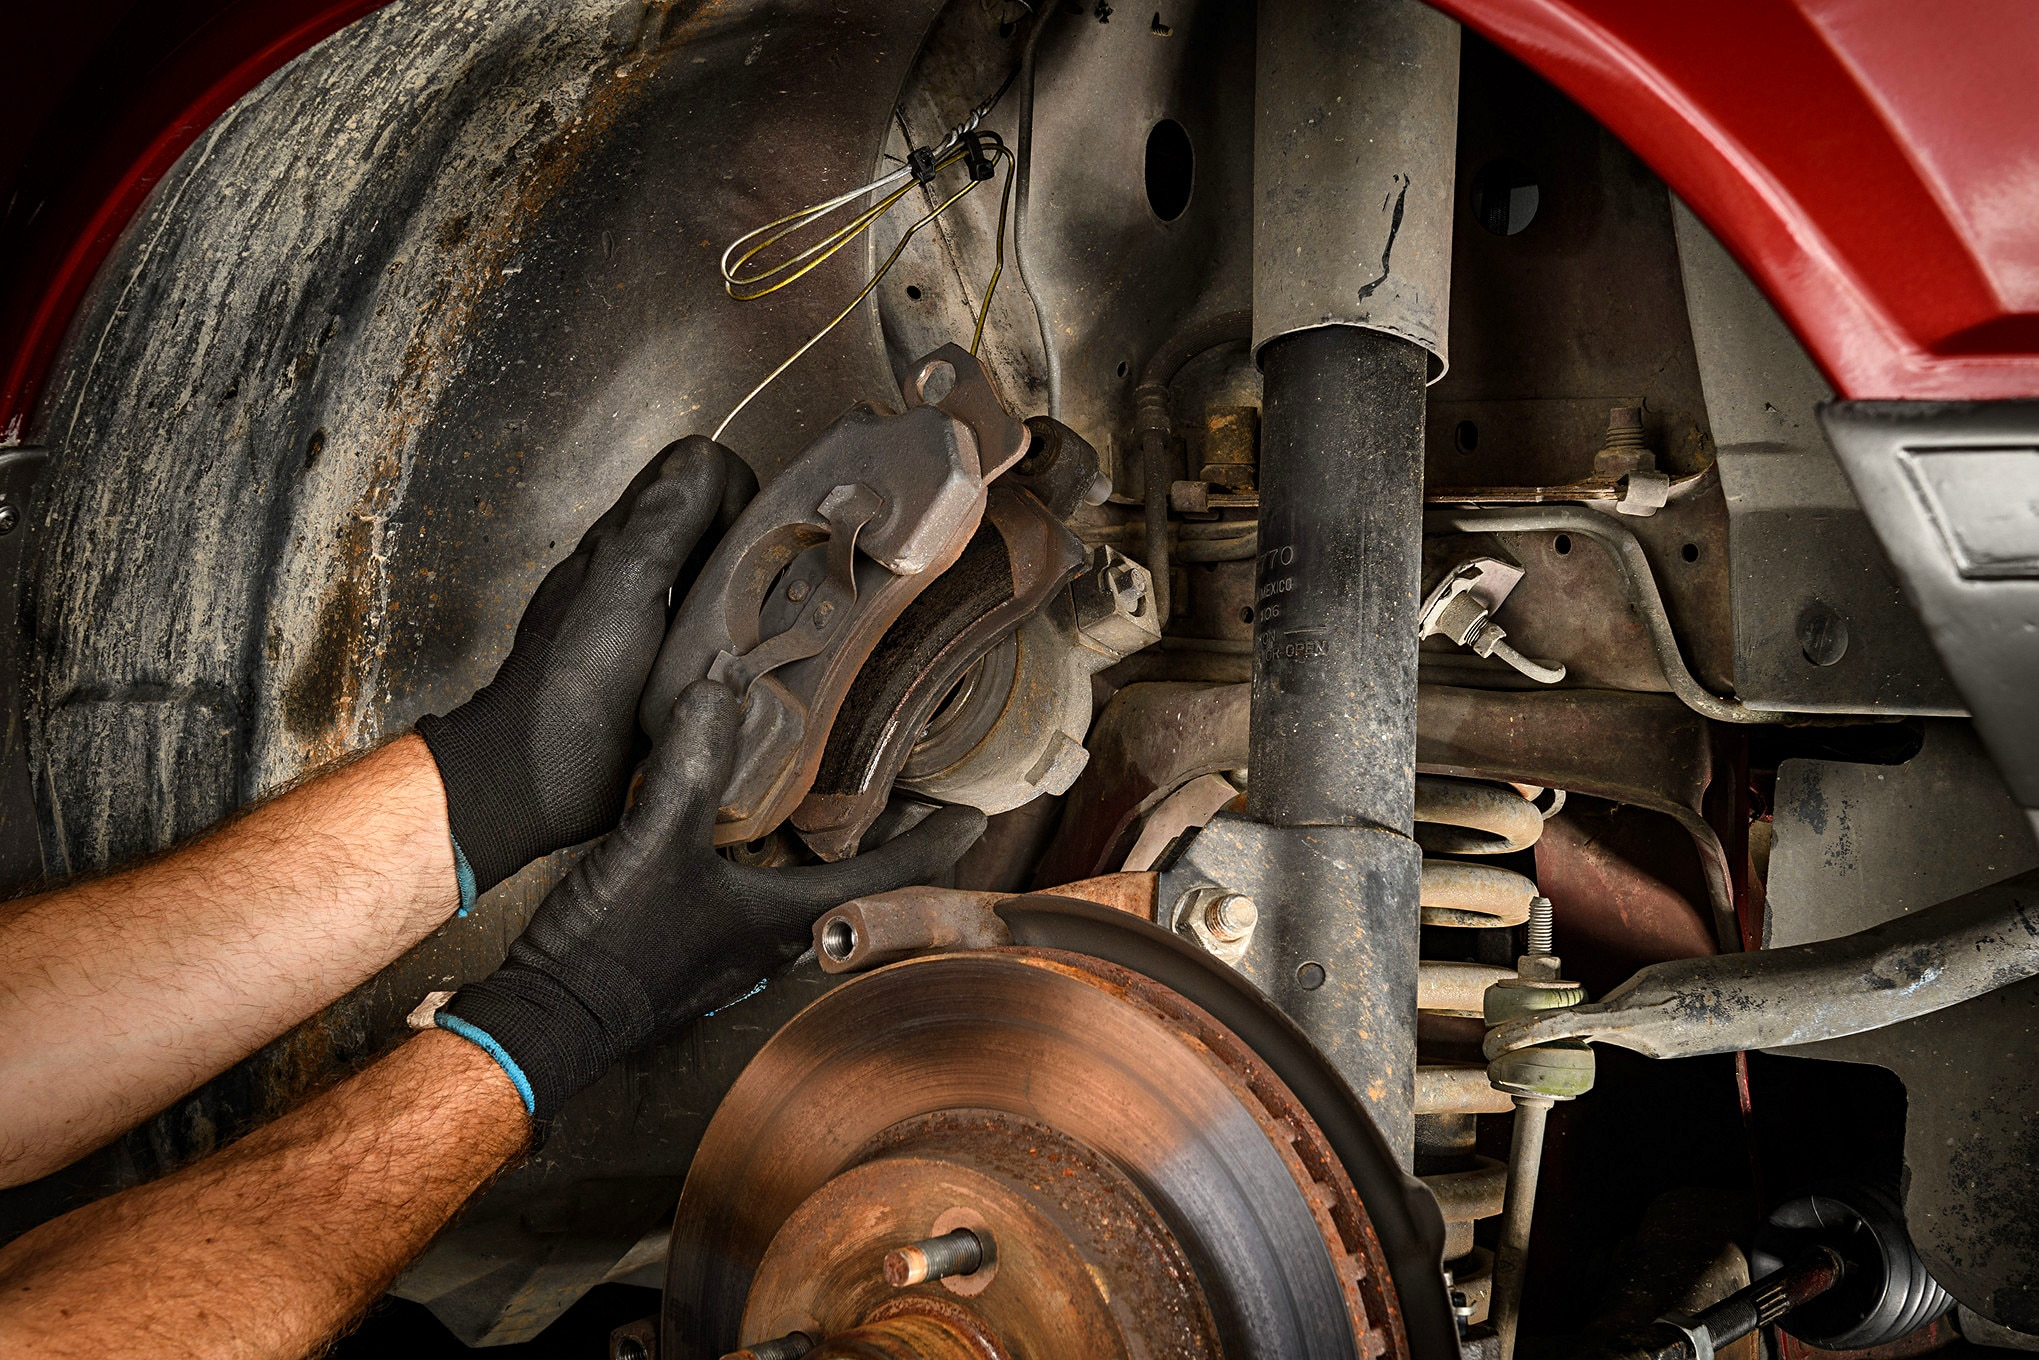 010 Mustang Front Brake Caliper Removal